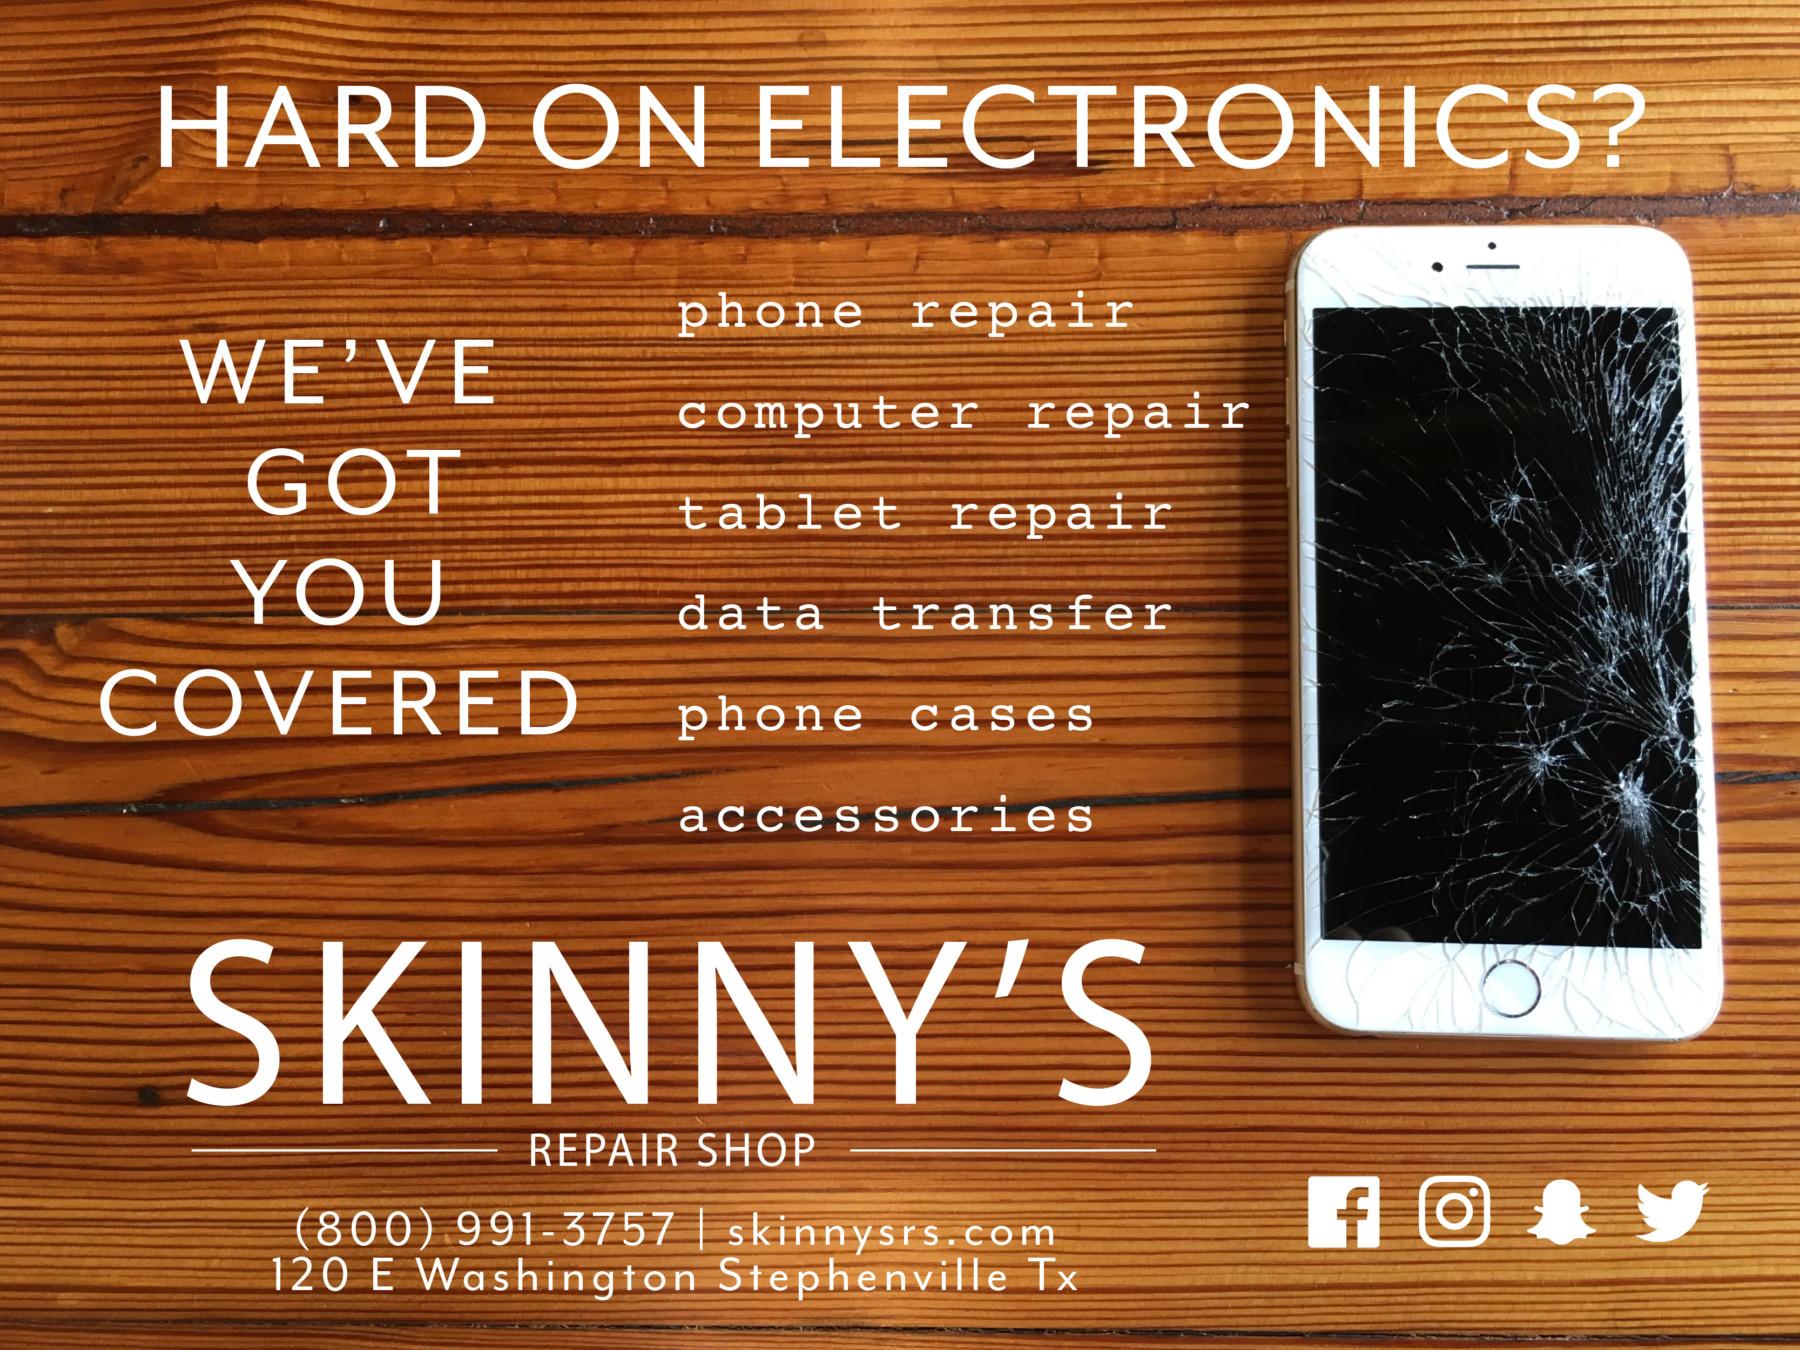 Skinny's Ad